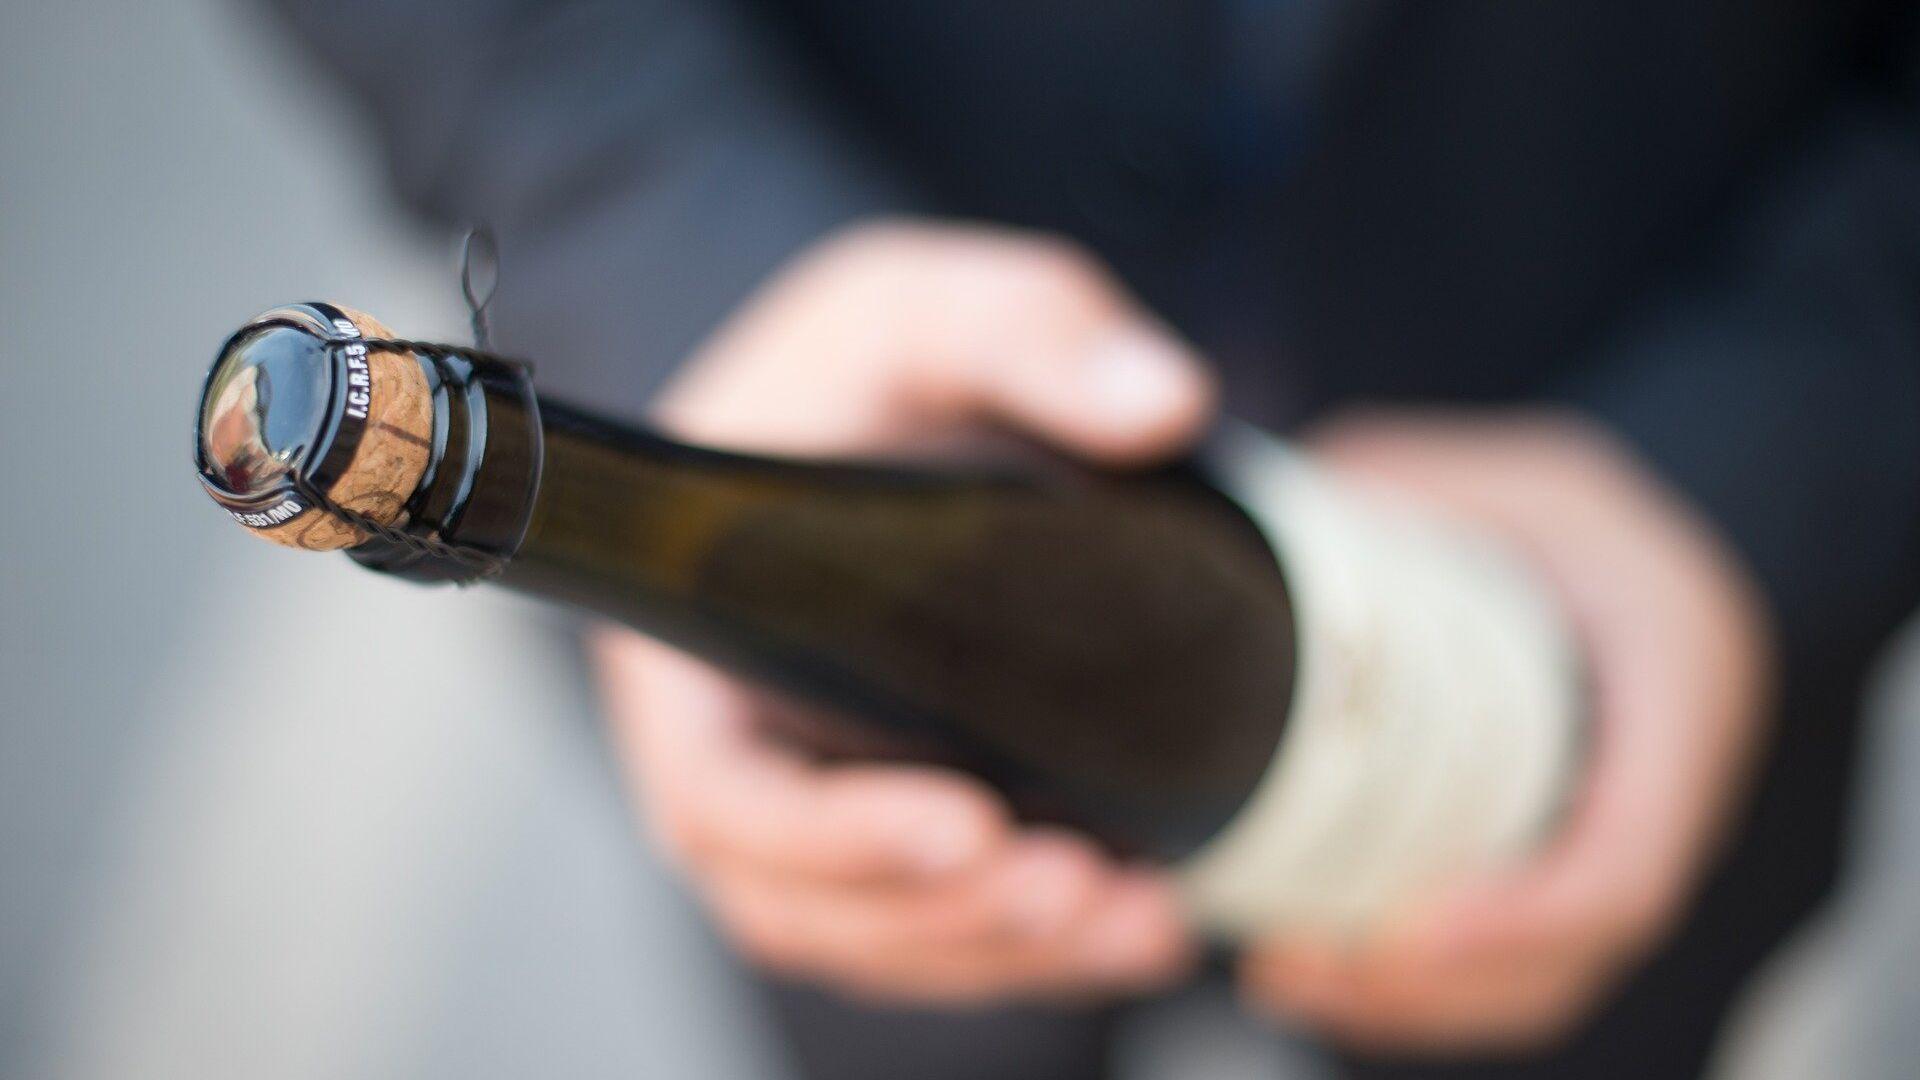 Una botella de champán (imagen referencial) - Sputnik Mundo, 1920, 01.08.2021